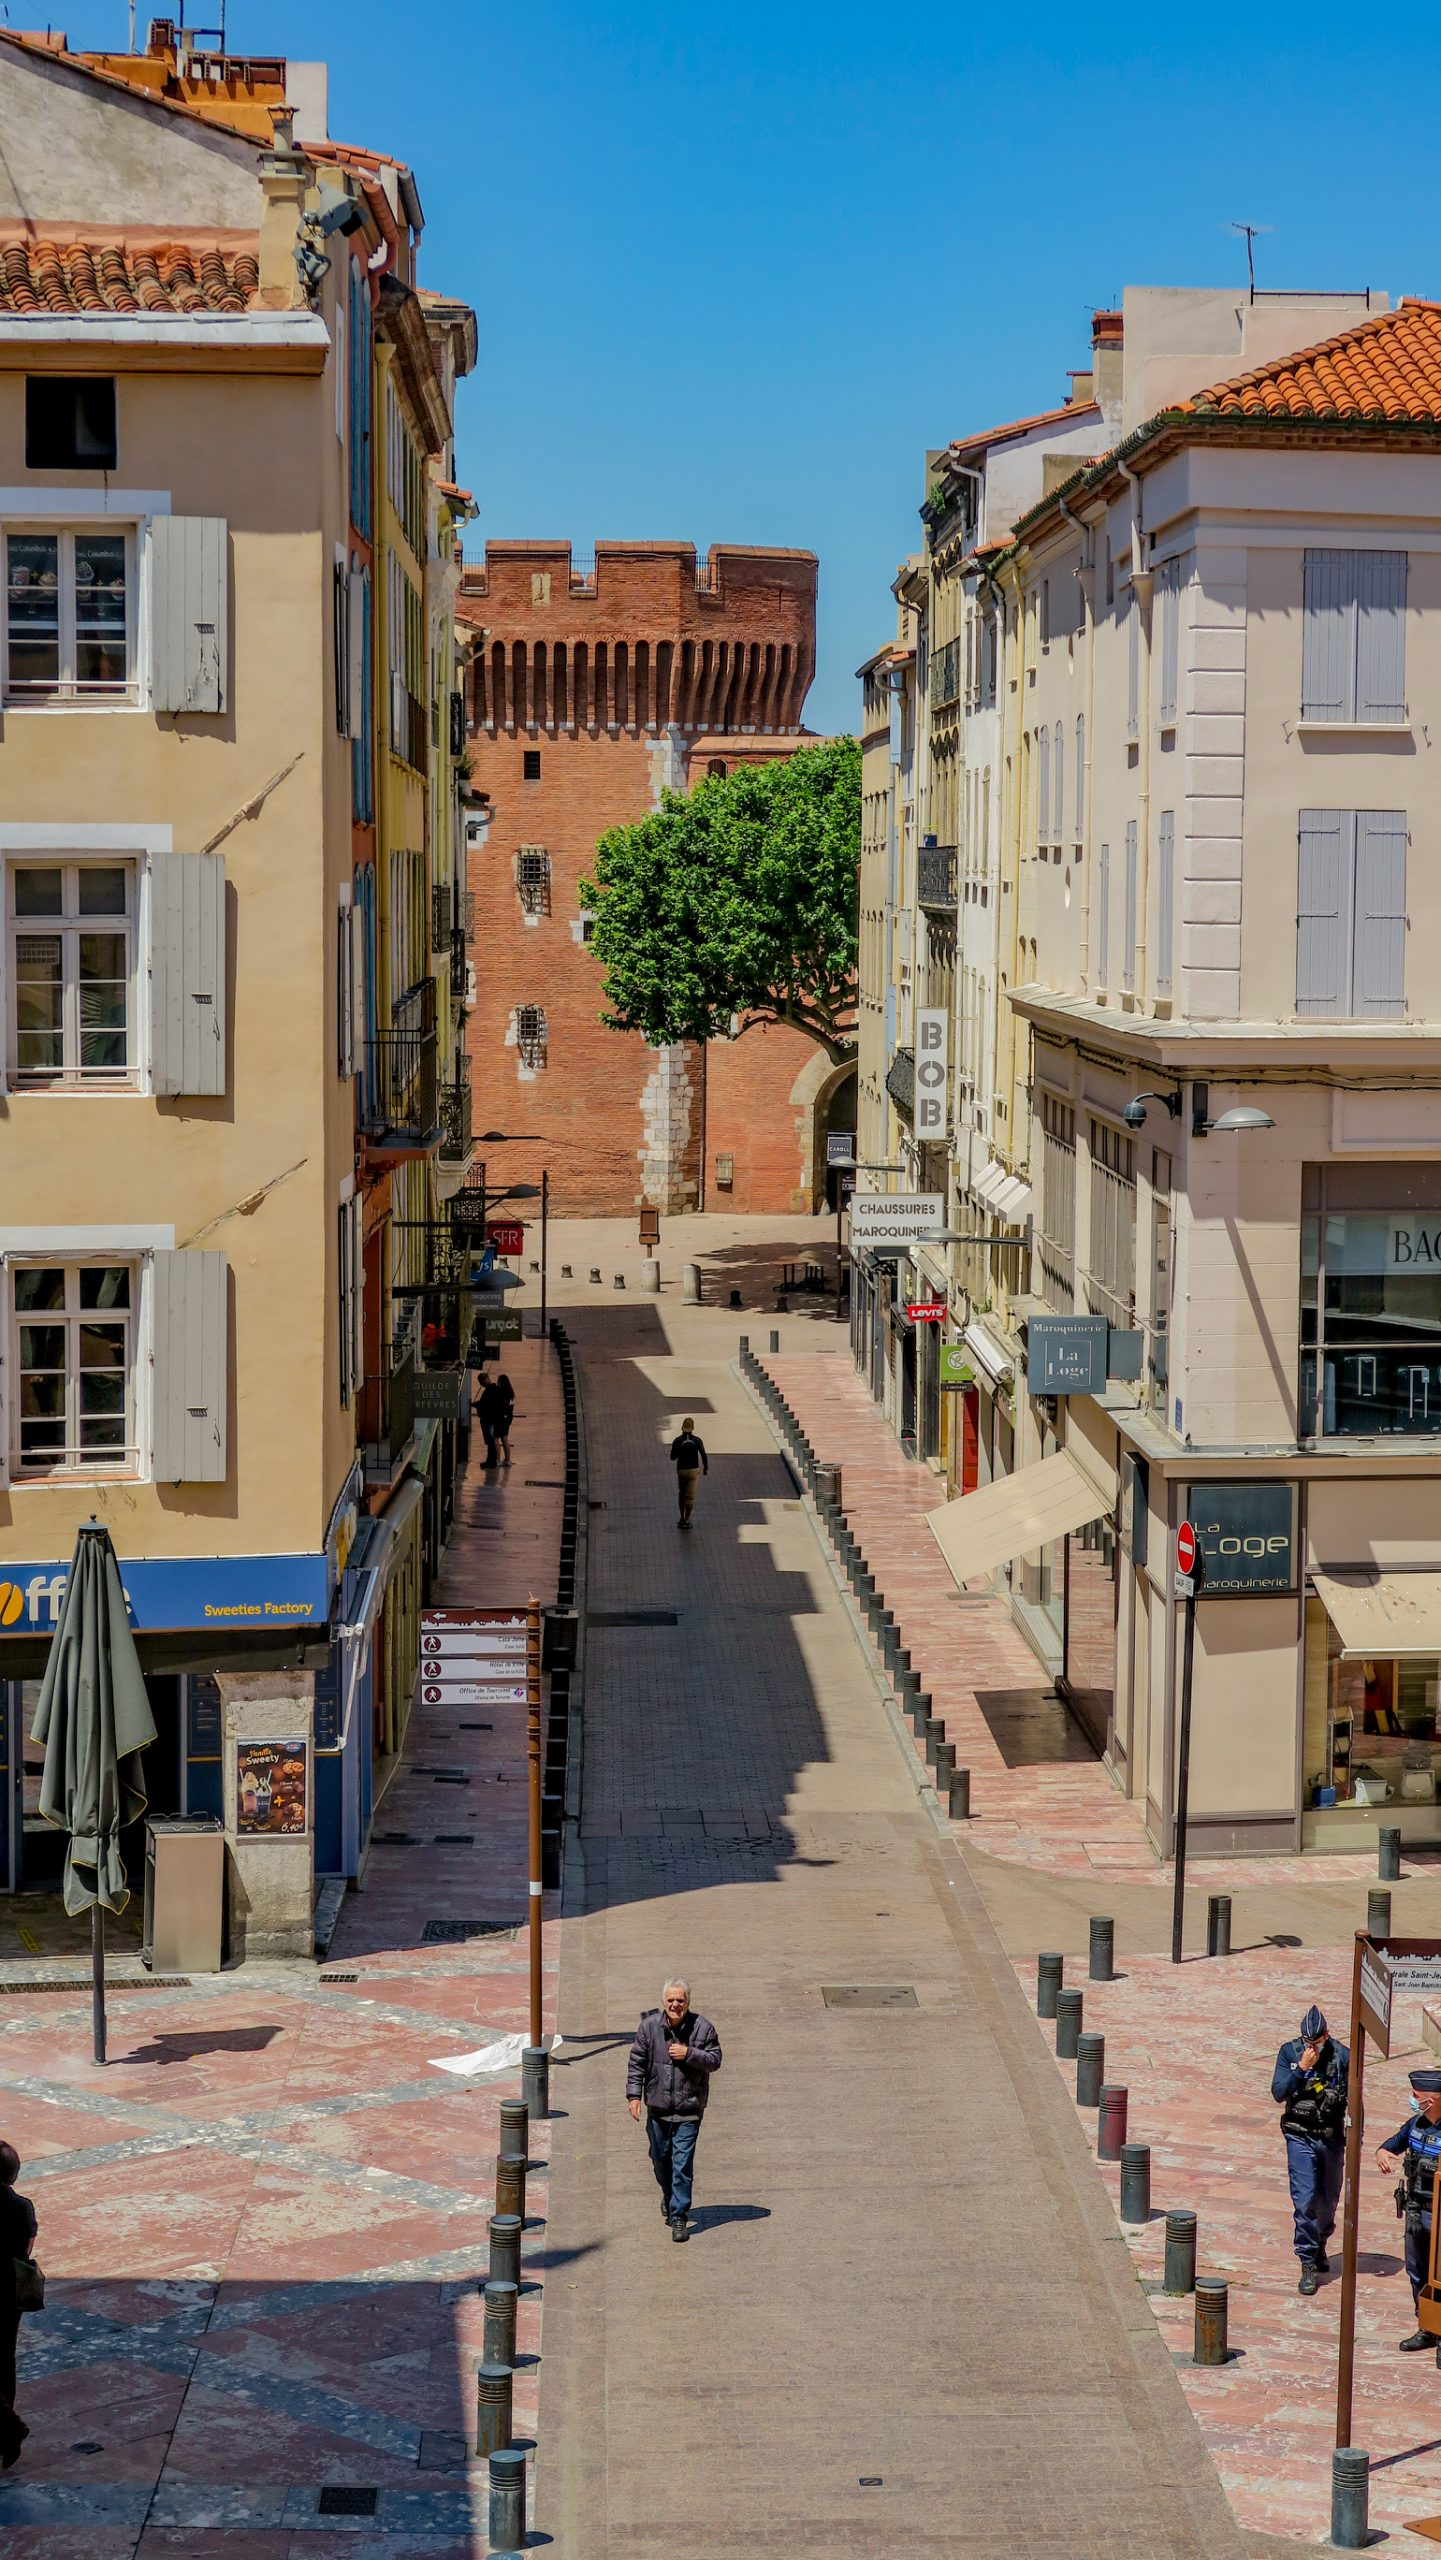 rue principale de Perpignan qui mène au castillet